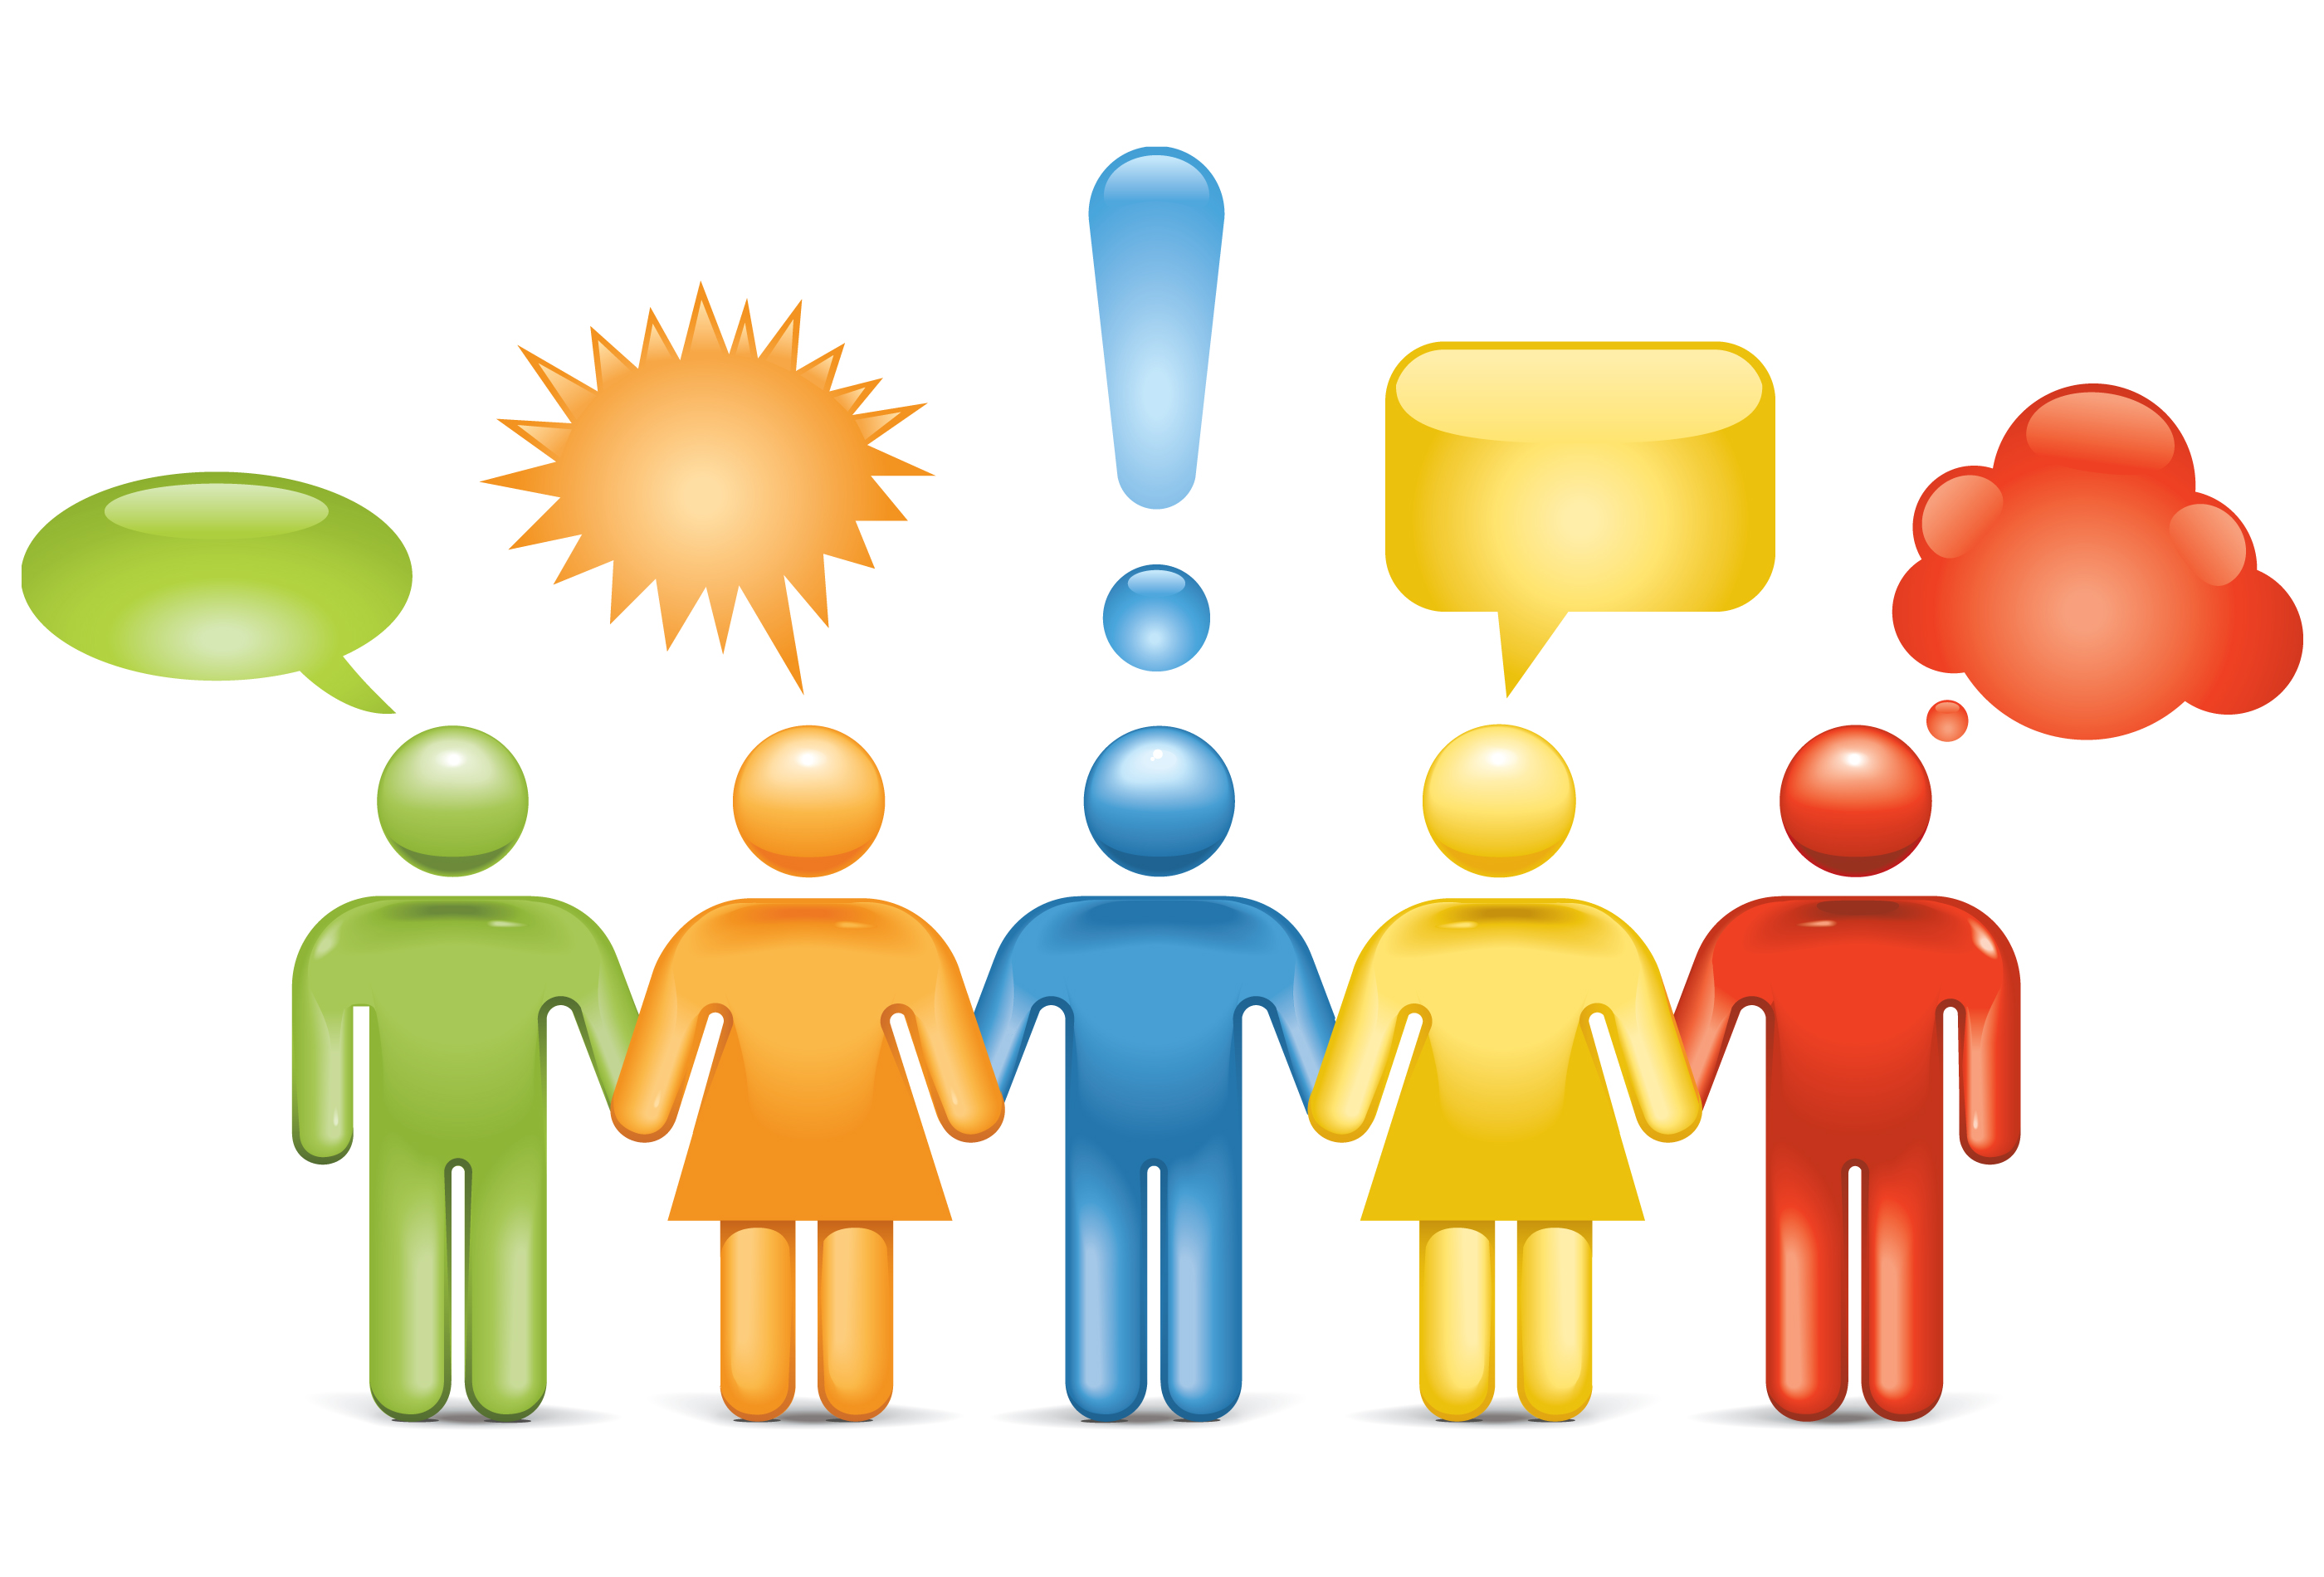 Cu1530 promote communication in health social care